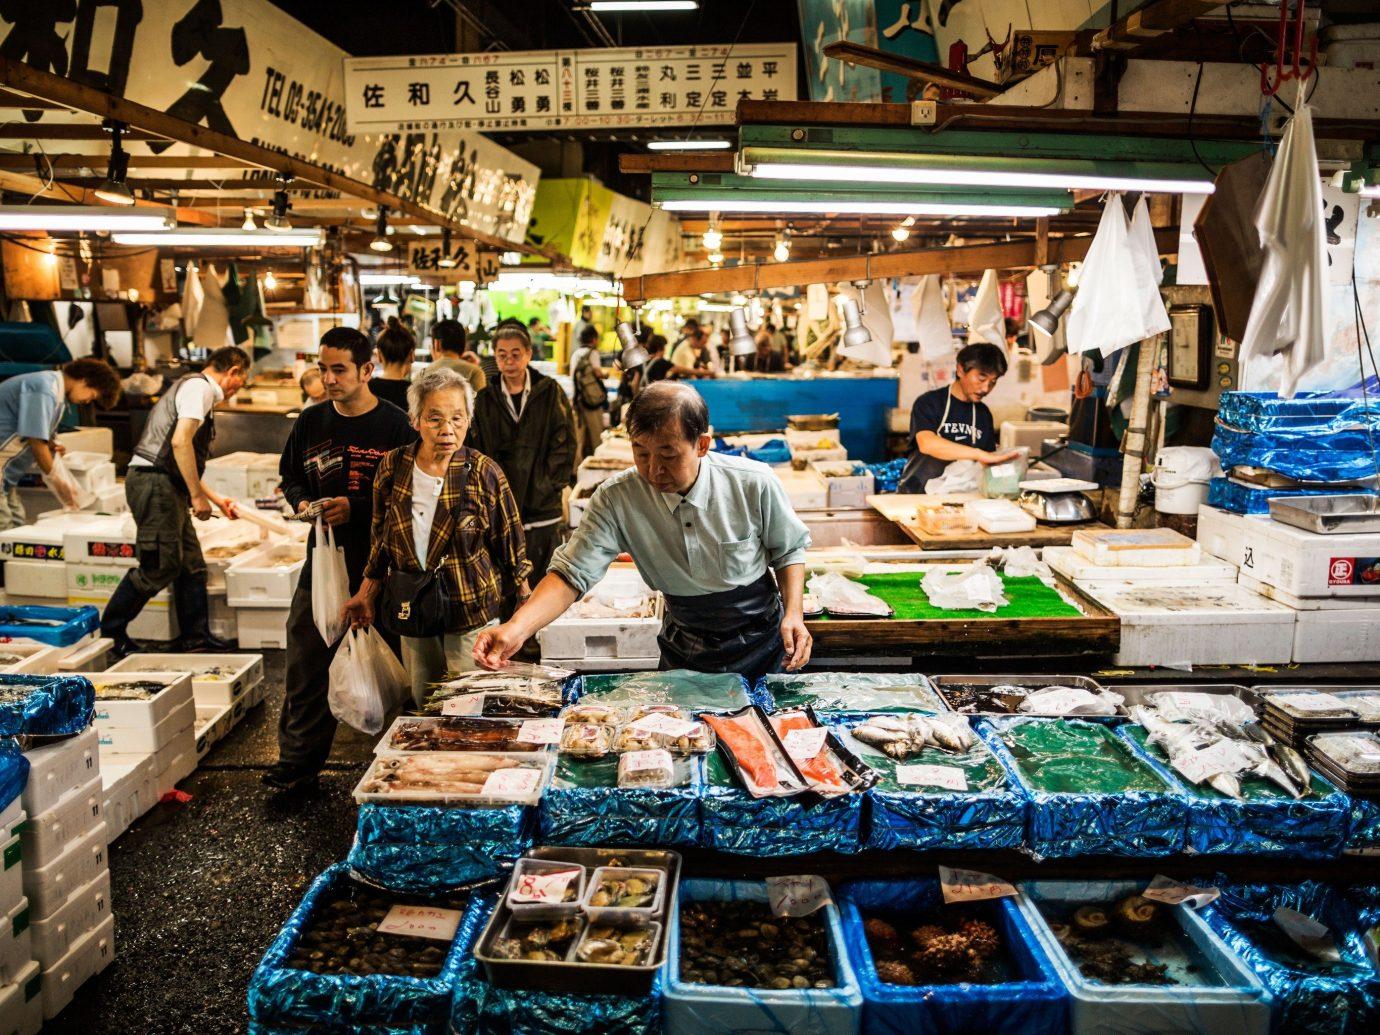 Trip Ideas market marketplace City public space geographical feature vendor human settlement bazaar scene retail grocery store flea market stall produce sale